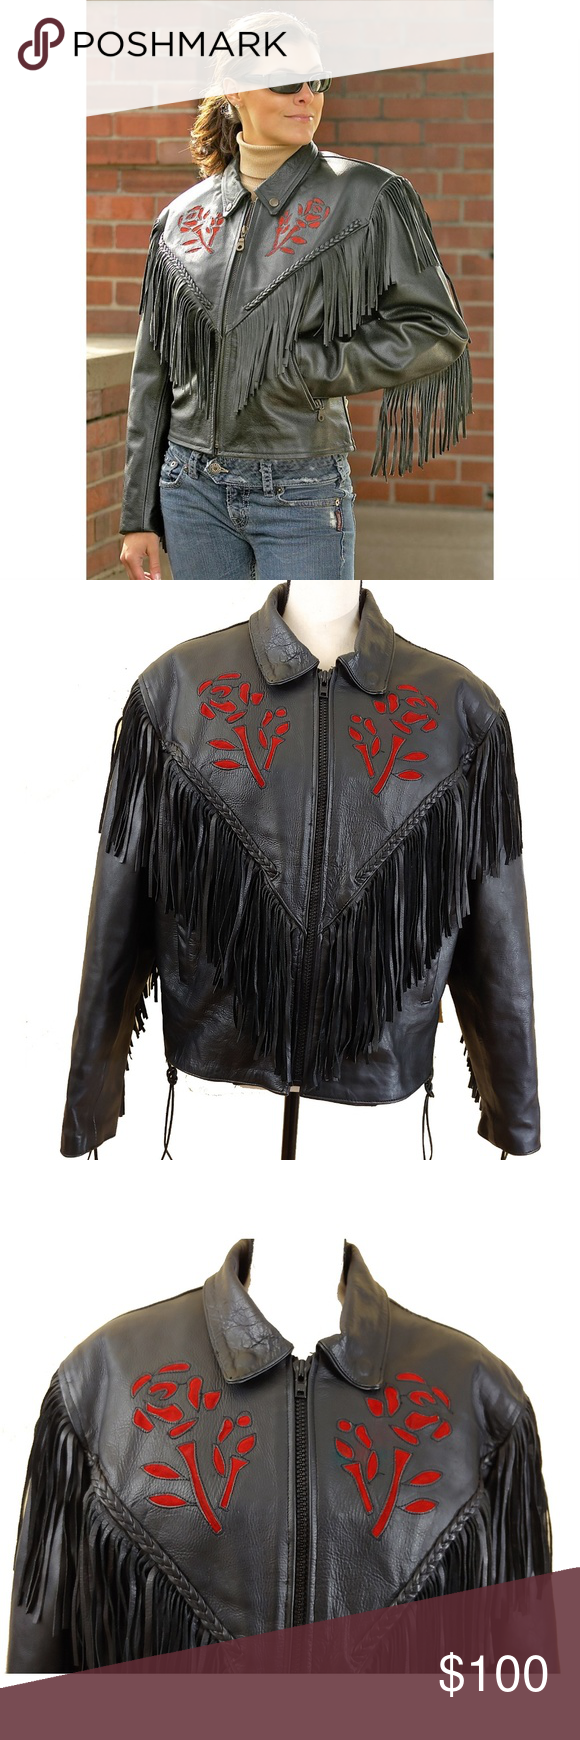 Interstate Leather Women S Motorcycle Jacket Xl Motorcycle Jacket Women Leather Women Jackets [ 1740 x 580 Pixel ]